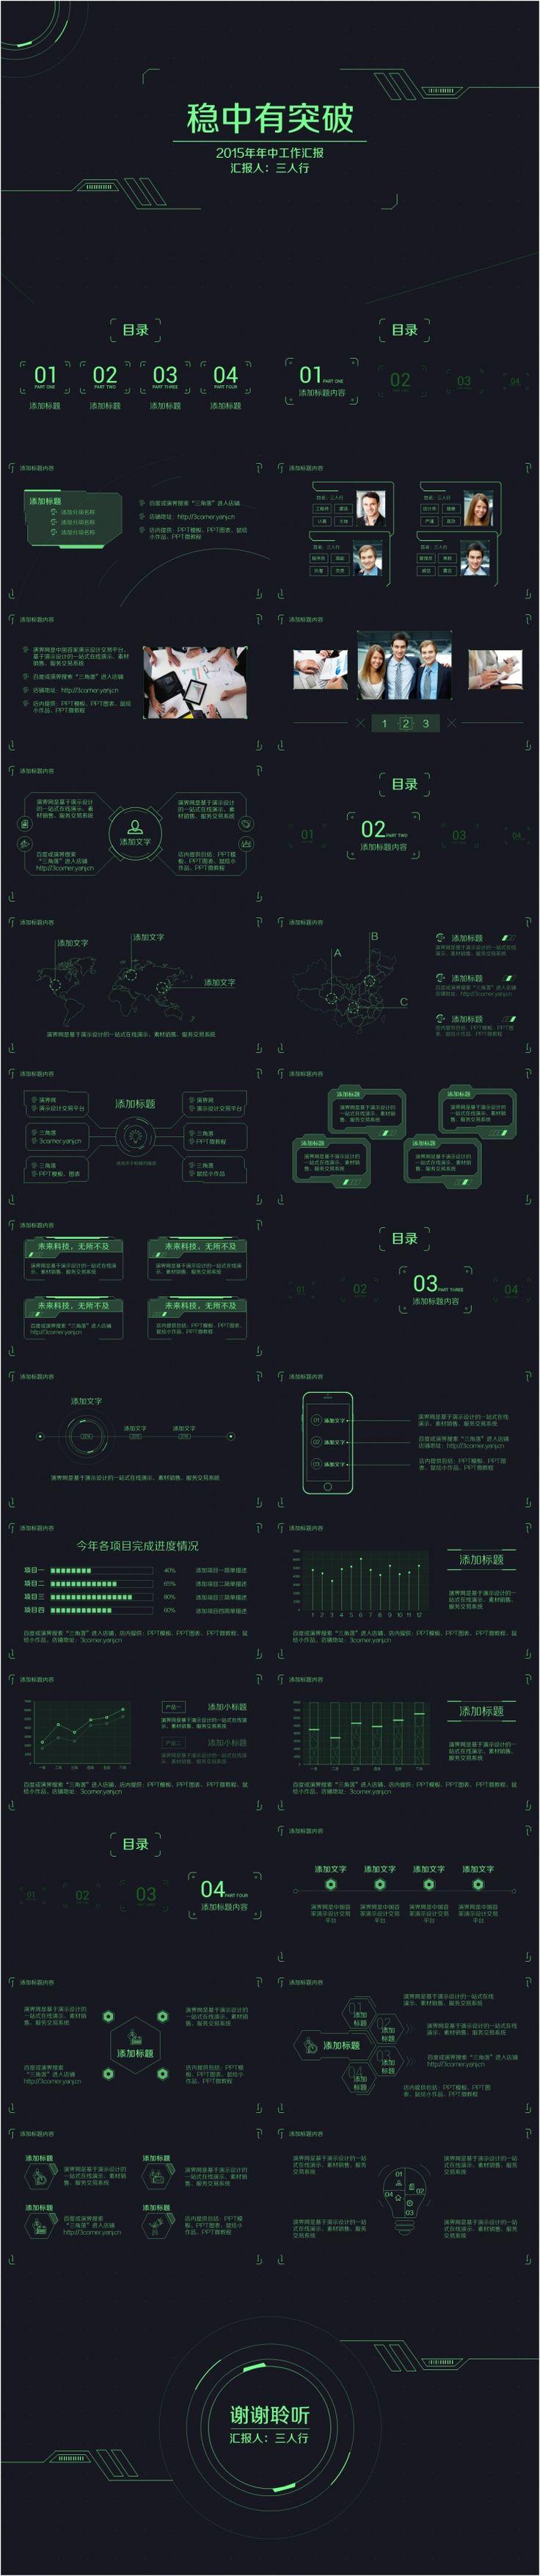 "powerpoint template 【时光之""绿""】未来科技UI风格汇报模板"